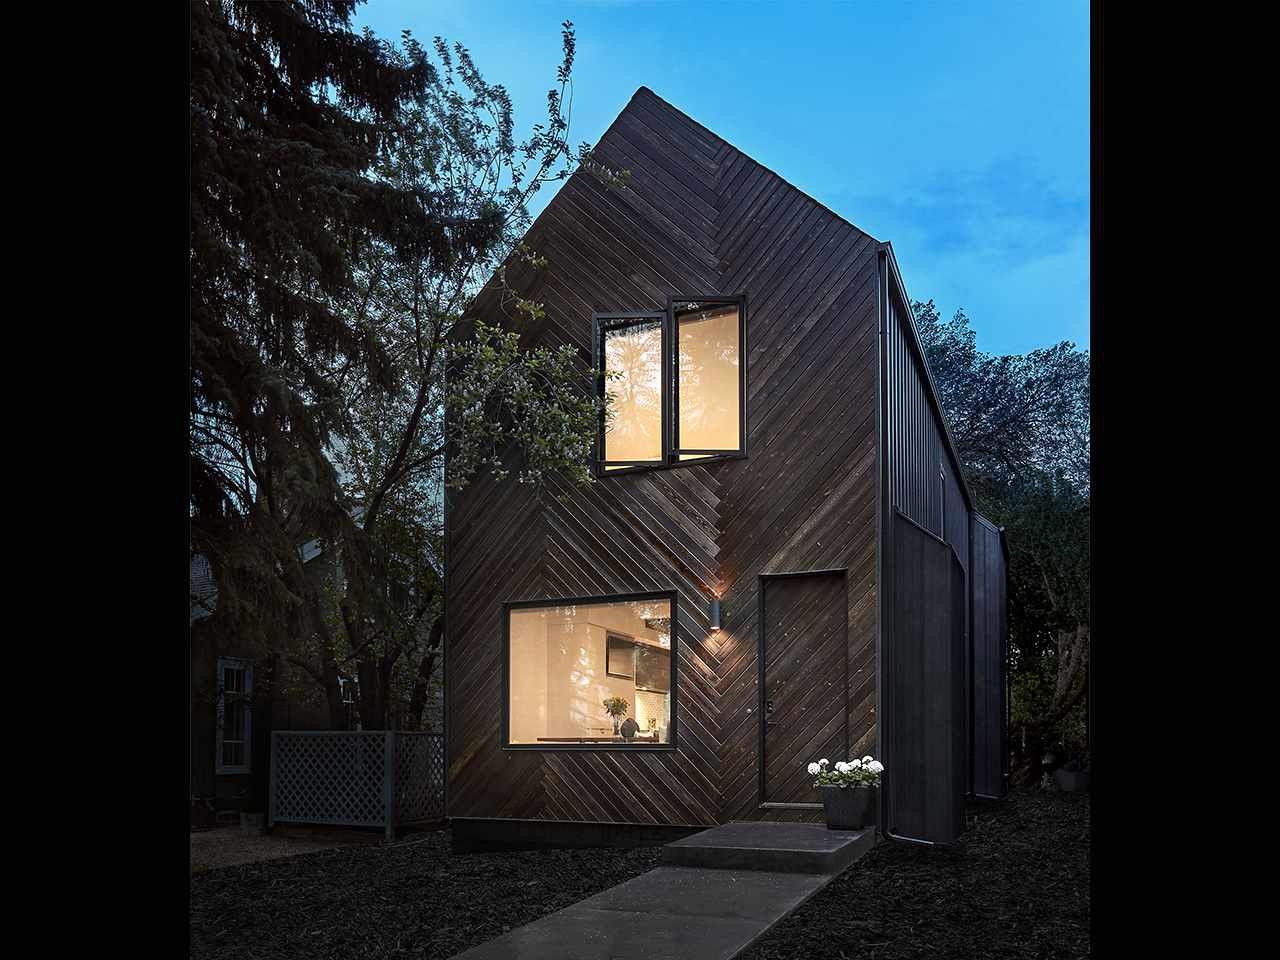 Main Photo: 10423 133 Street in Edmonton: Zone 11 House for sale : MLS®# E4155469